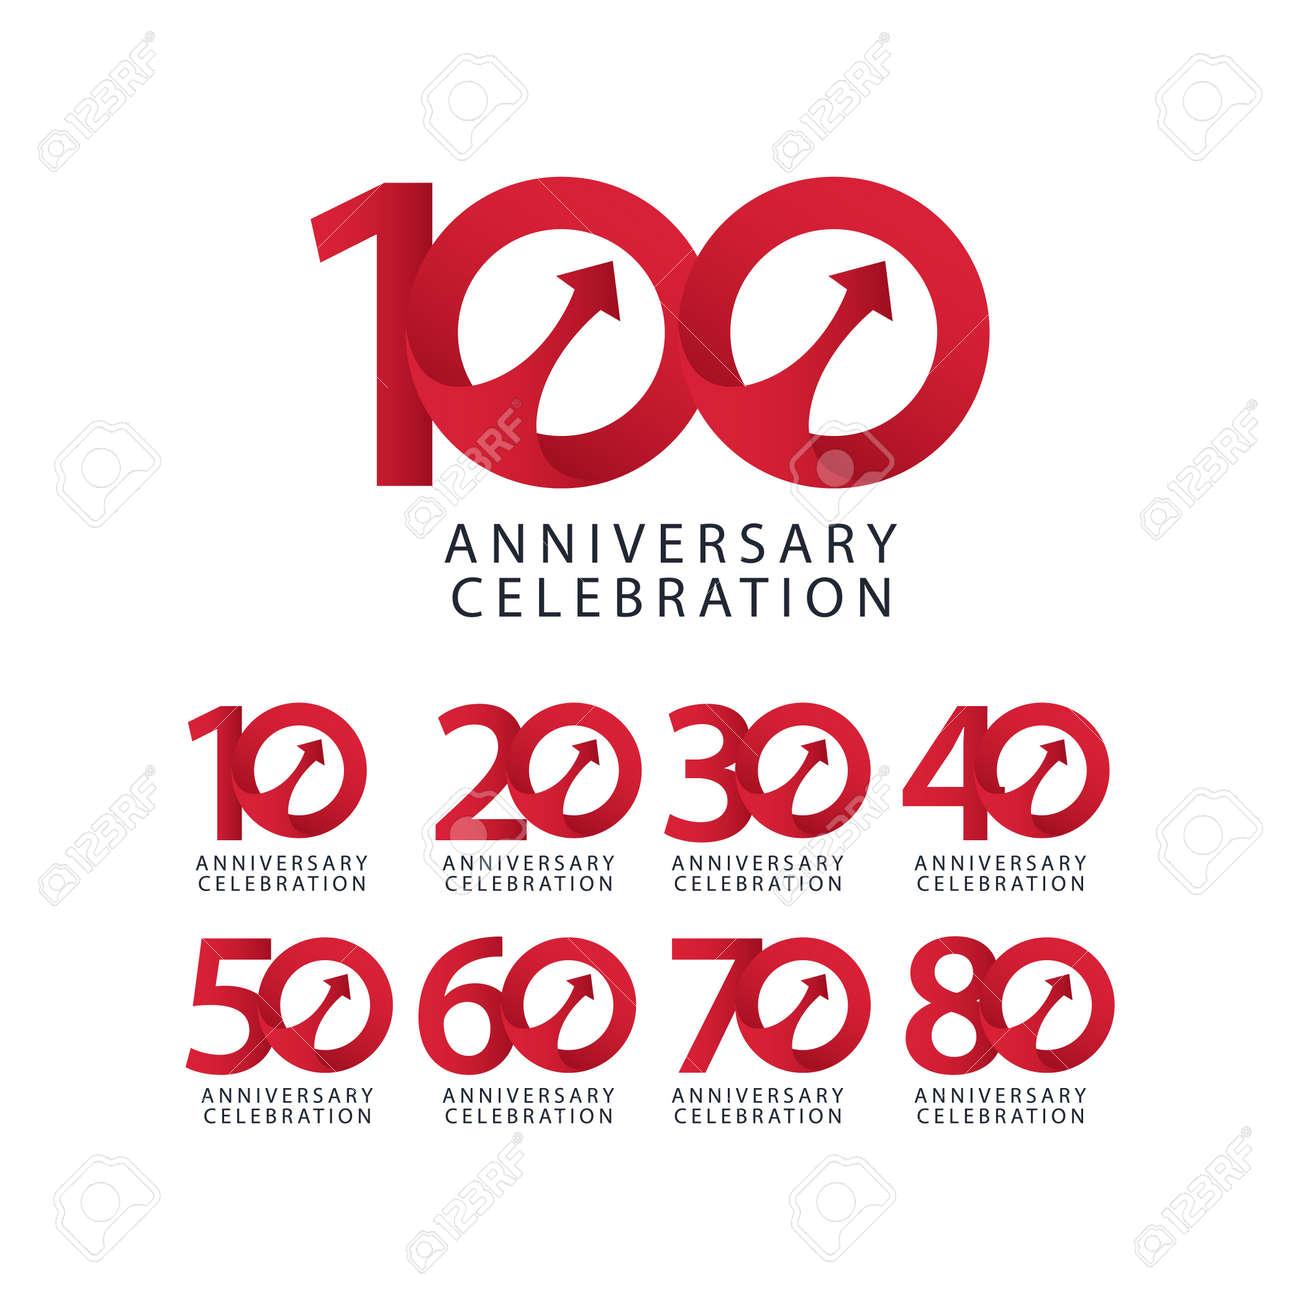 100 Years Anniversary Celebration Vector Template Design Illustration - 163698164